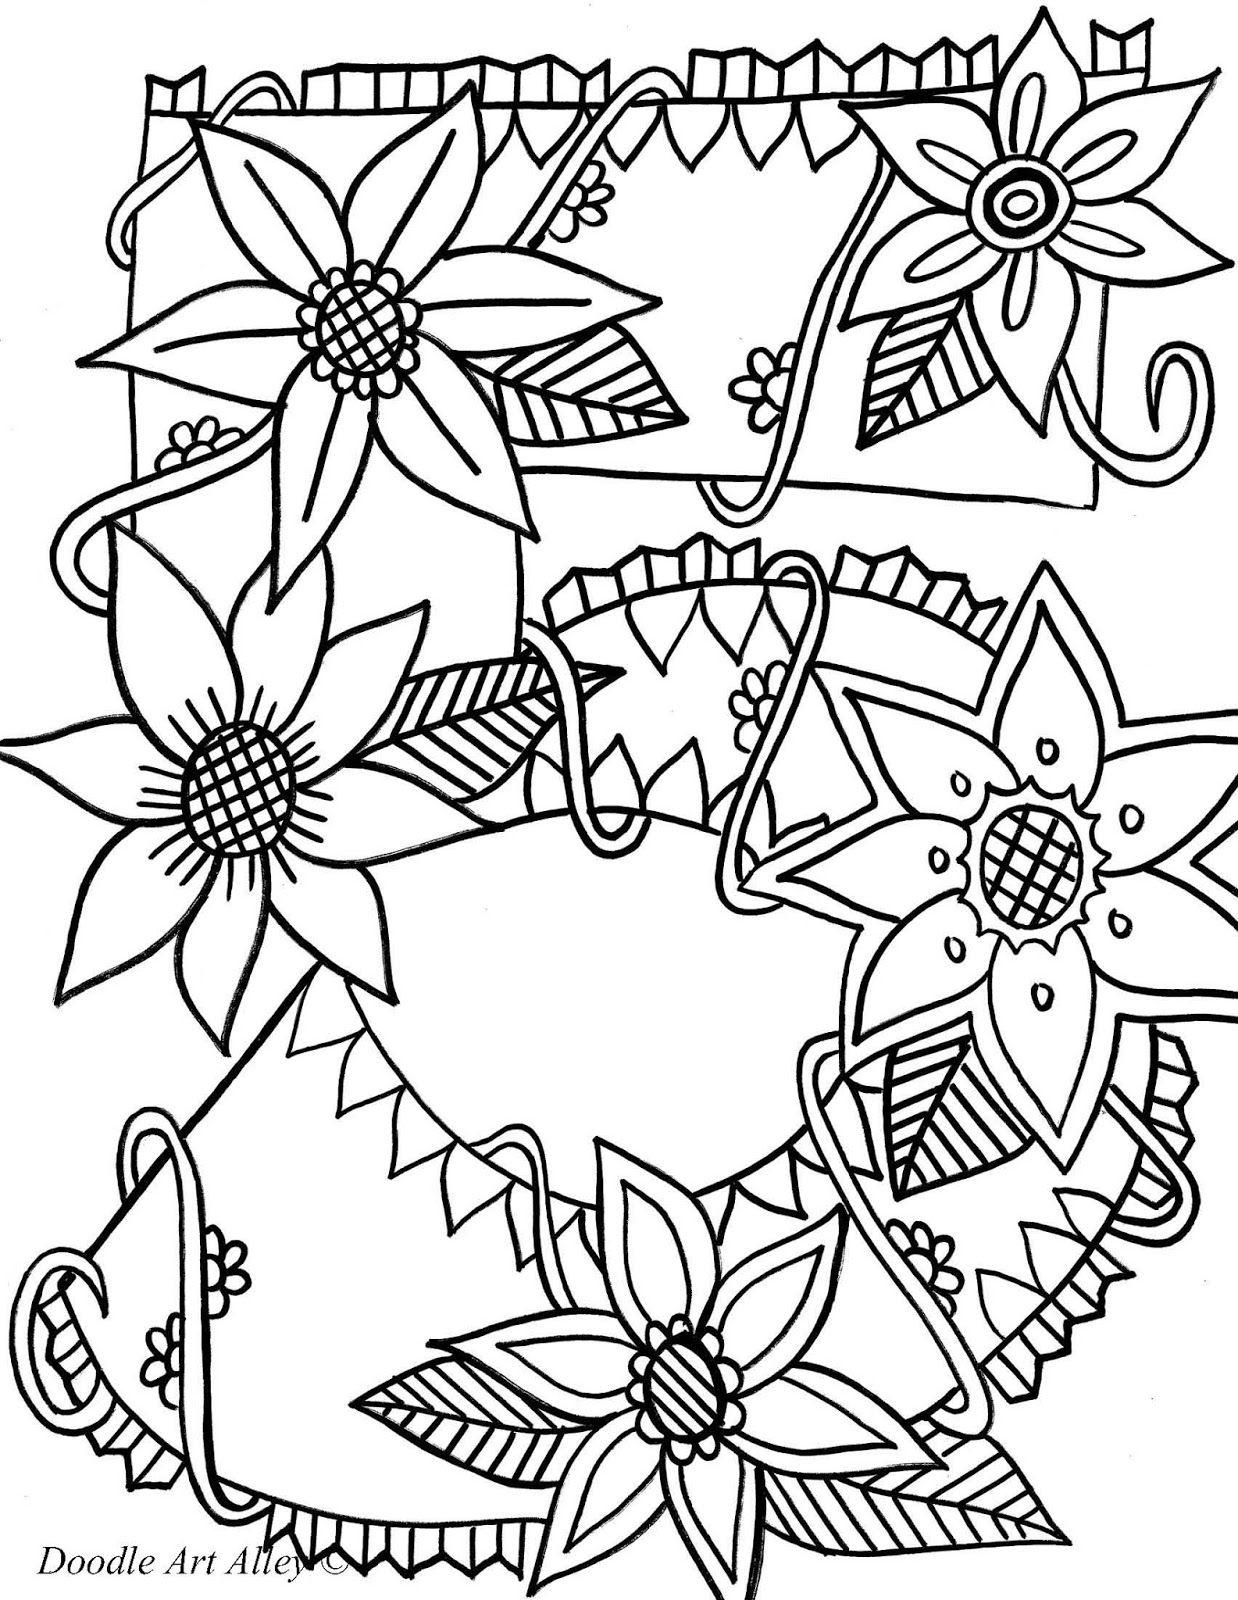 http://www.doodle-art-alley.com/ sitesinden alıntı | математика ...